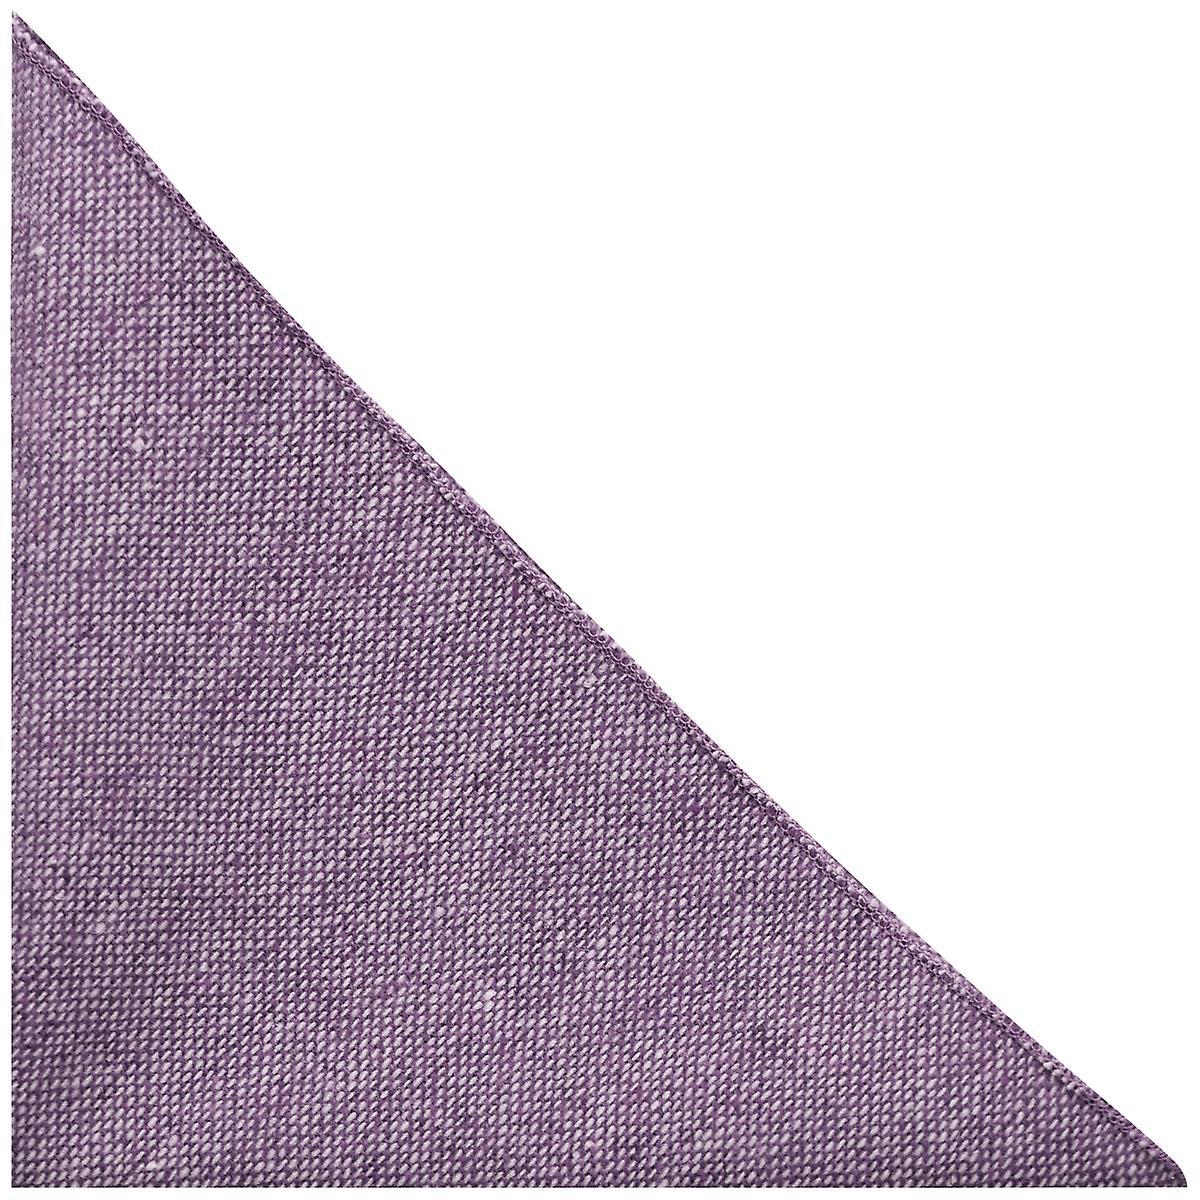 Highland Weave Stonewashed Purple Pocket Square, Handkerchief